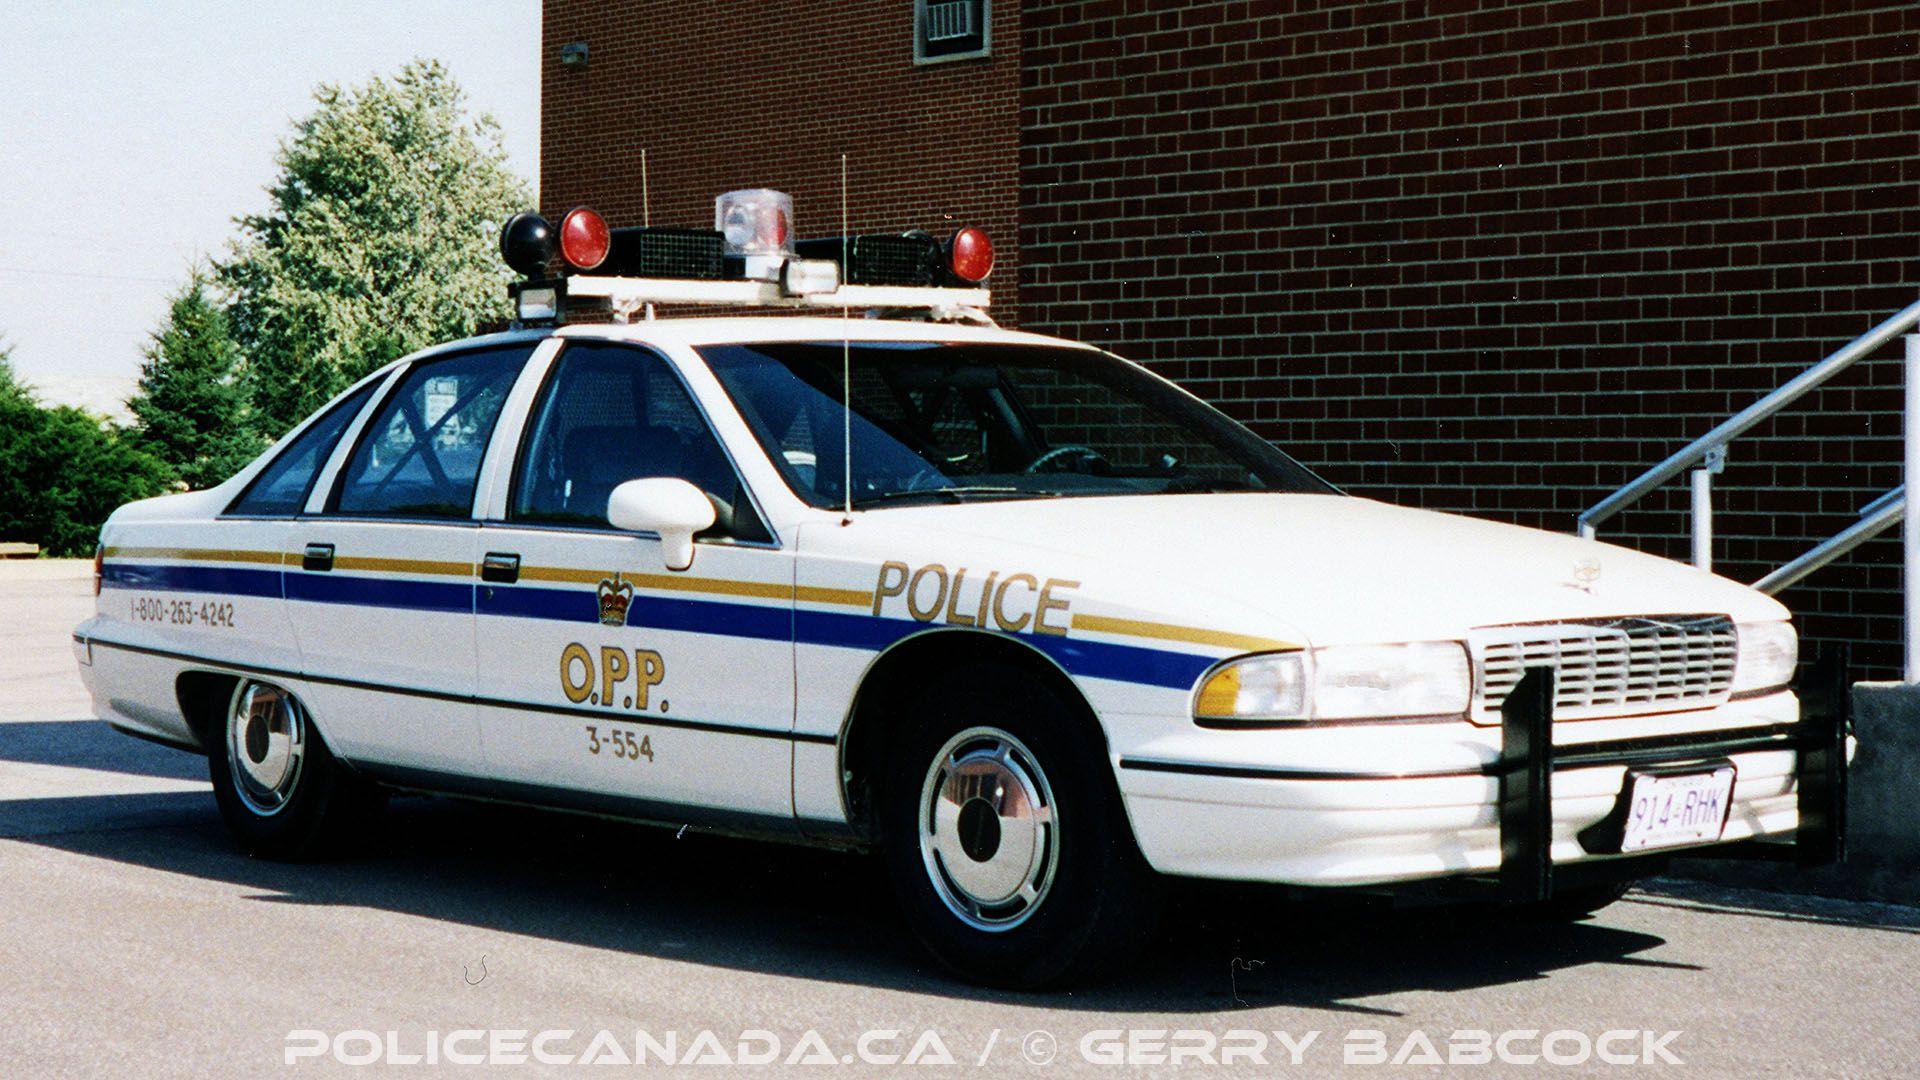 Todos Os Tamanhos Ontario Provincial Police On Flickr Compartilhamento De Fotos Police Cars Old Police Cars Commercial Vehicle